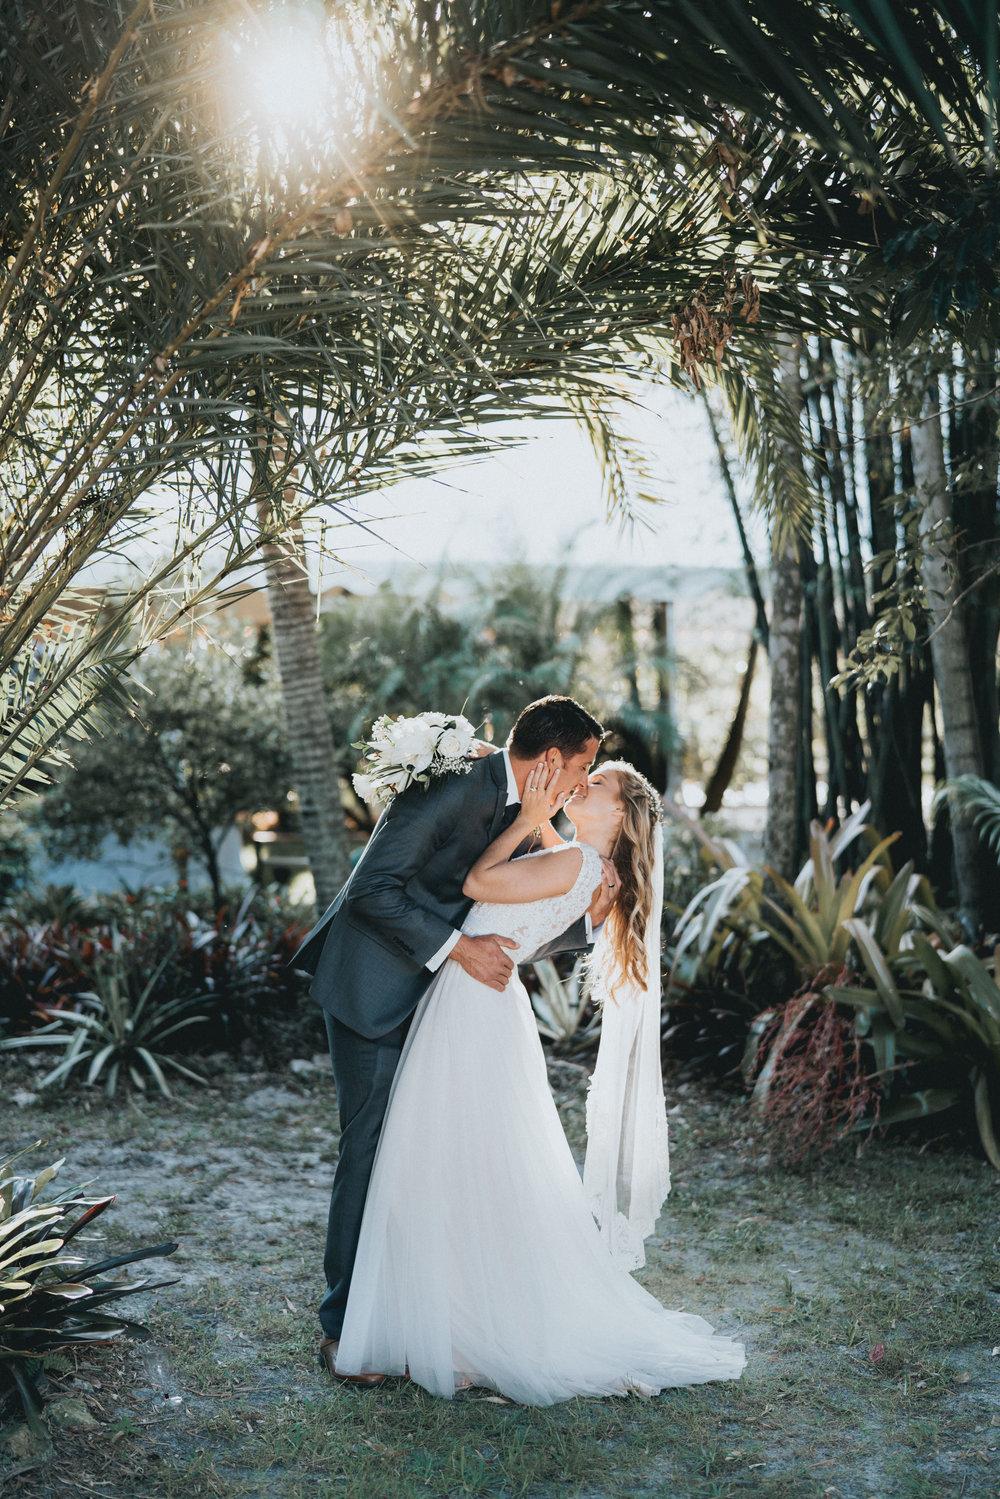 botanical garden wedding in stuart - Botanical Garden Wedding